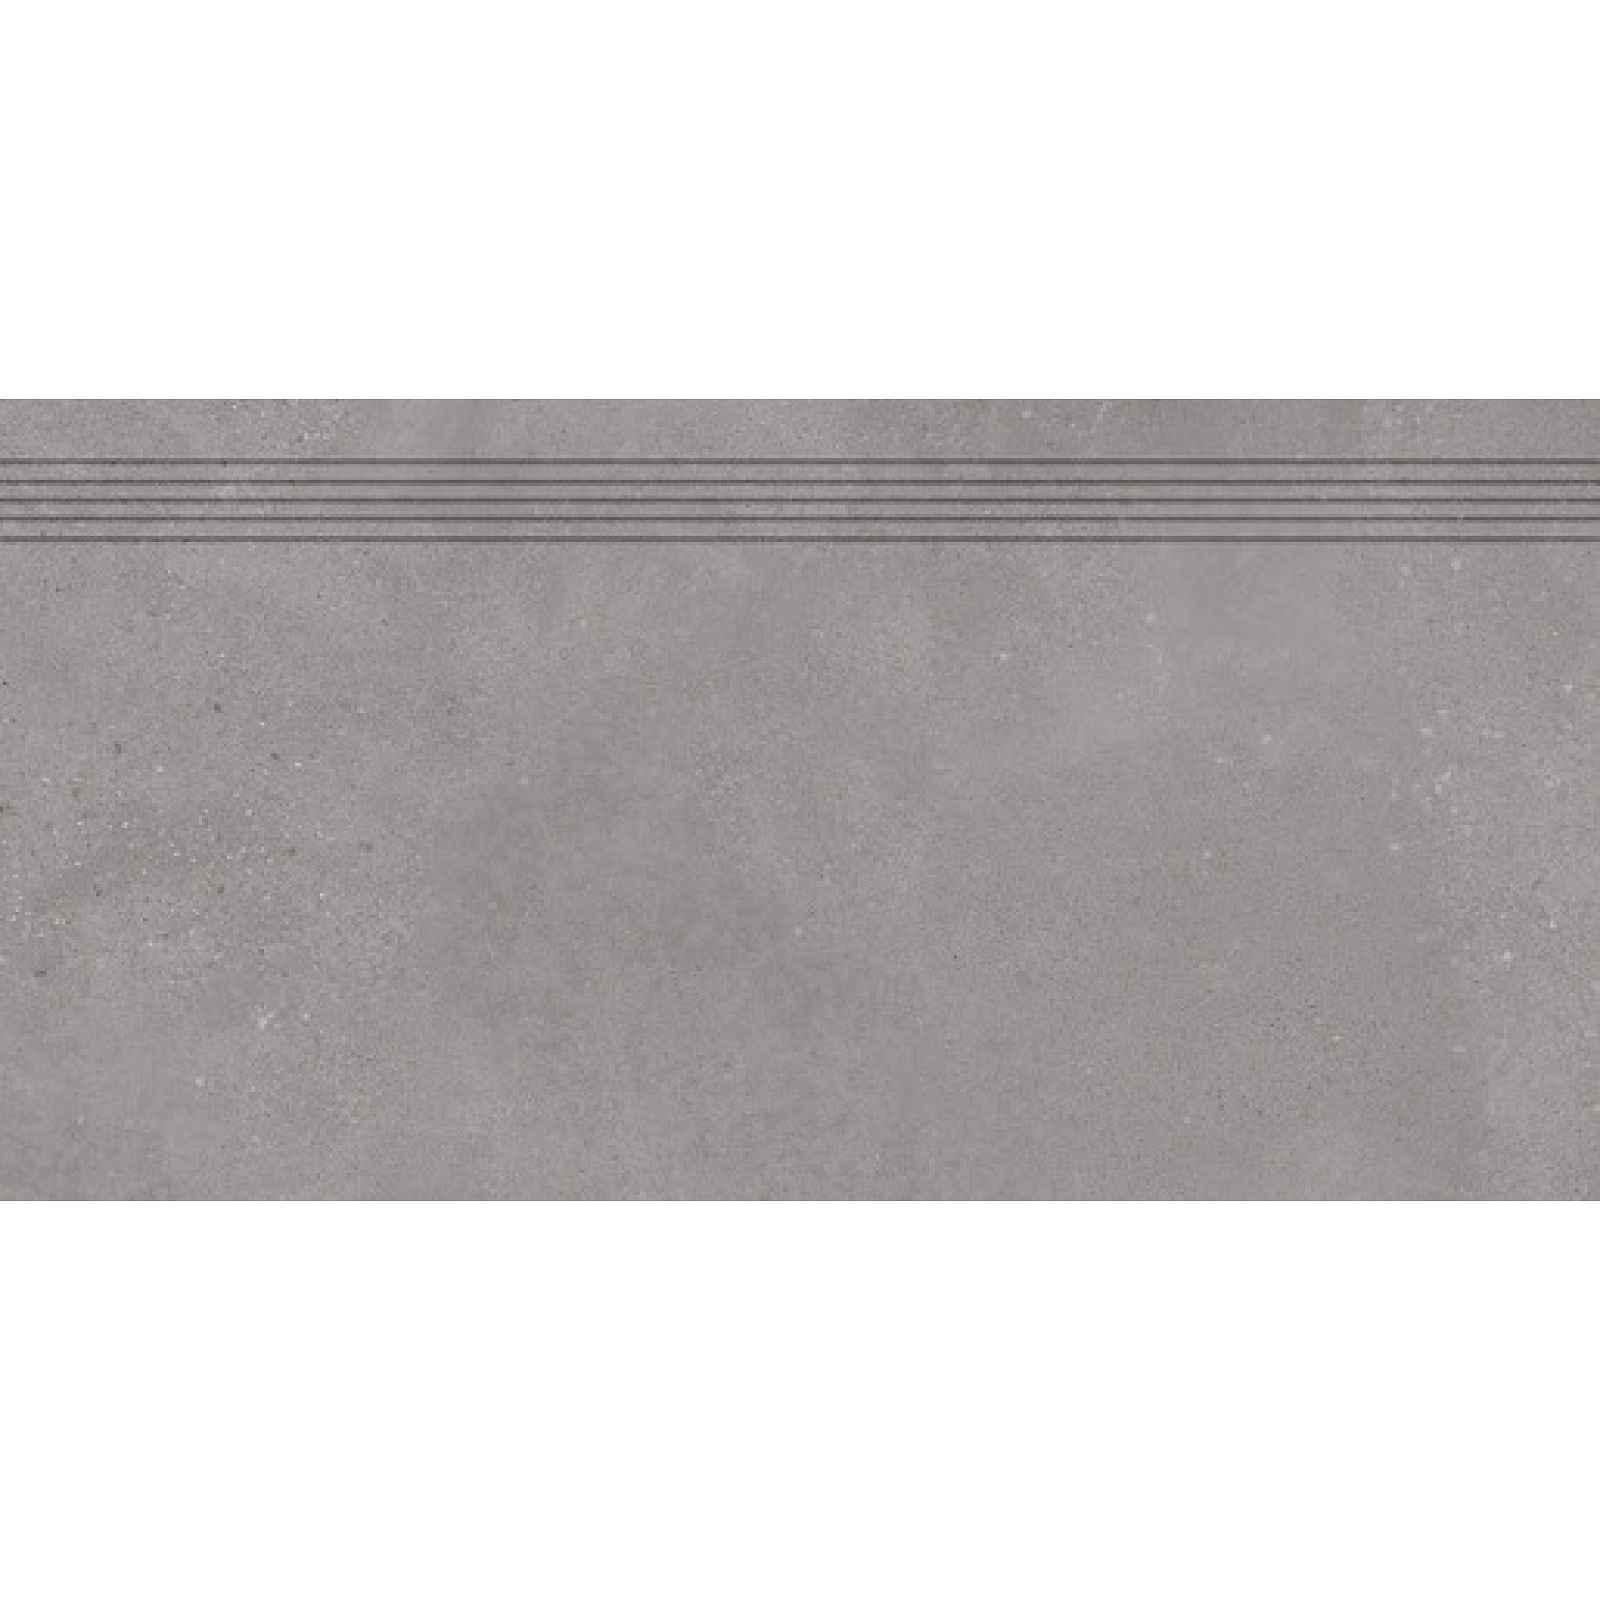 Schodovka RAKO Betonico šedá 40x80 cm mat DCP84791.1